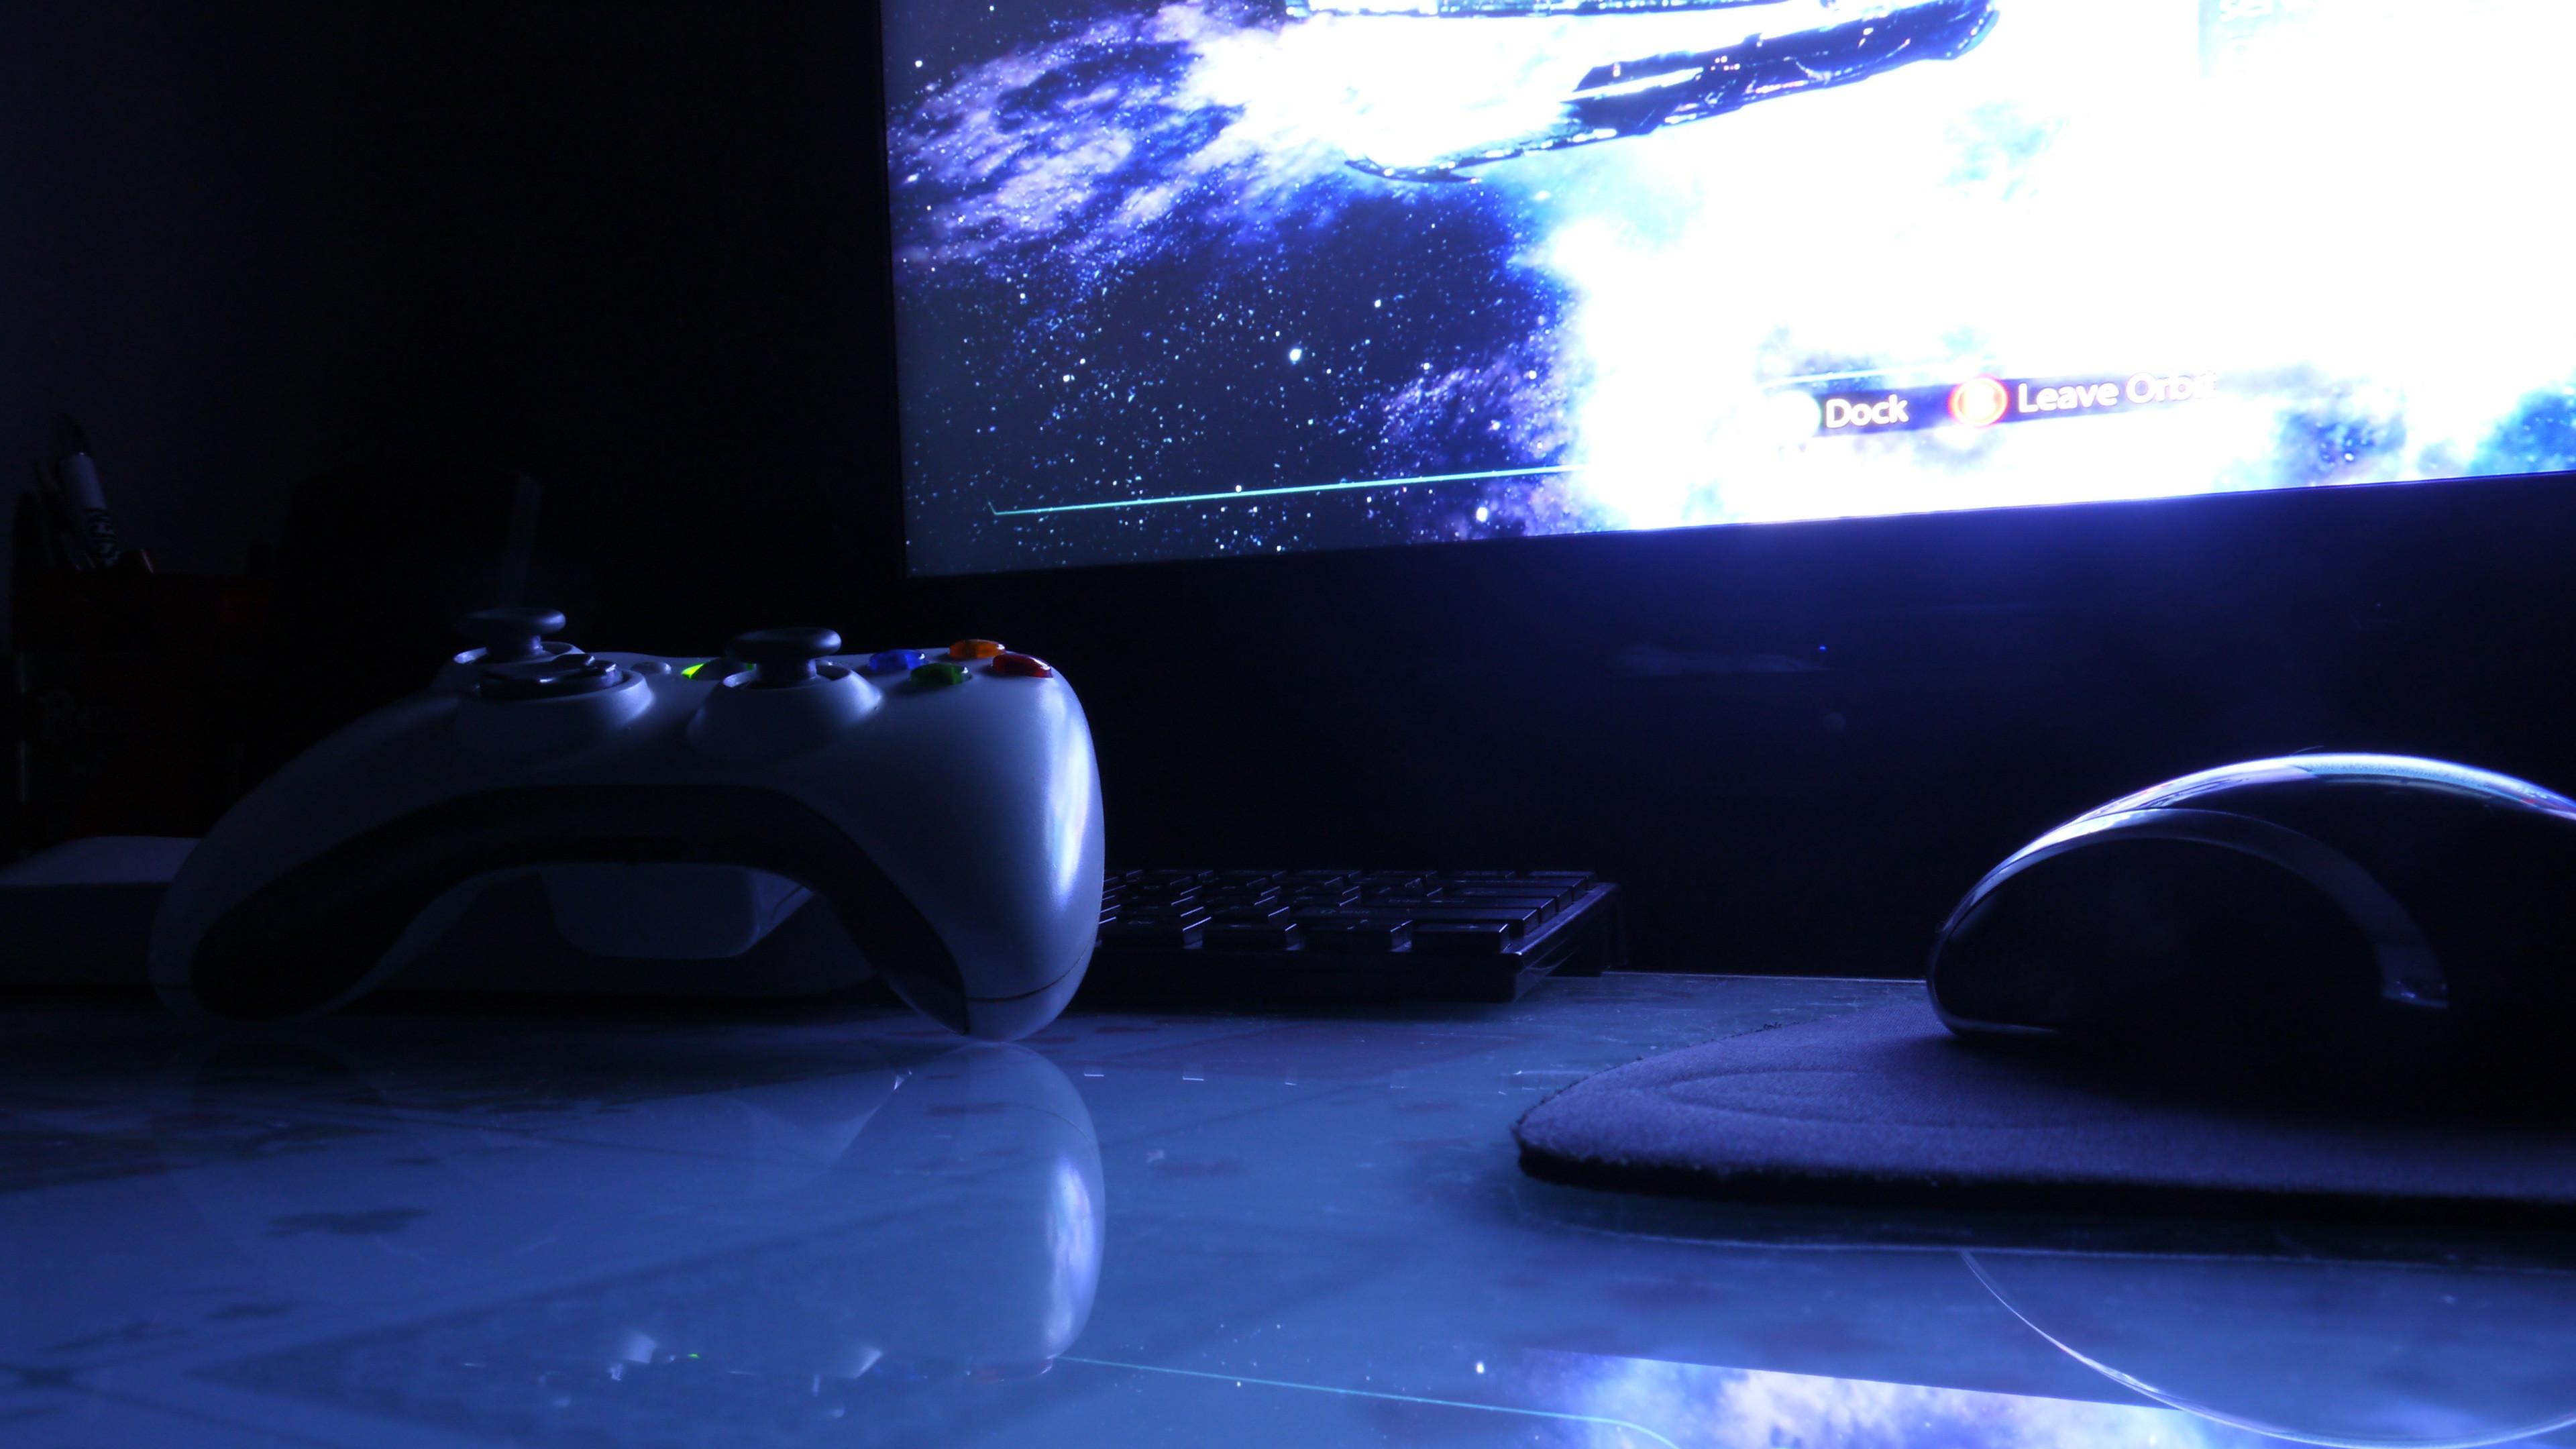 Blue gaming wallpaper 67 images - Gaming wallpaper ...